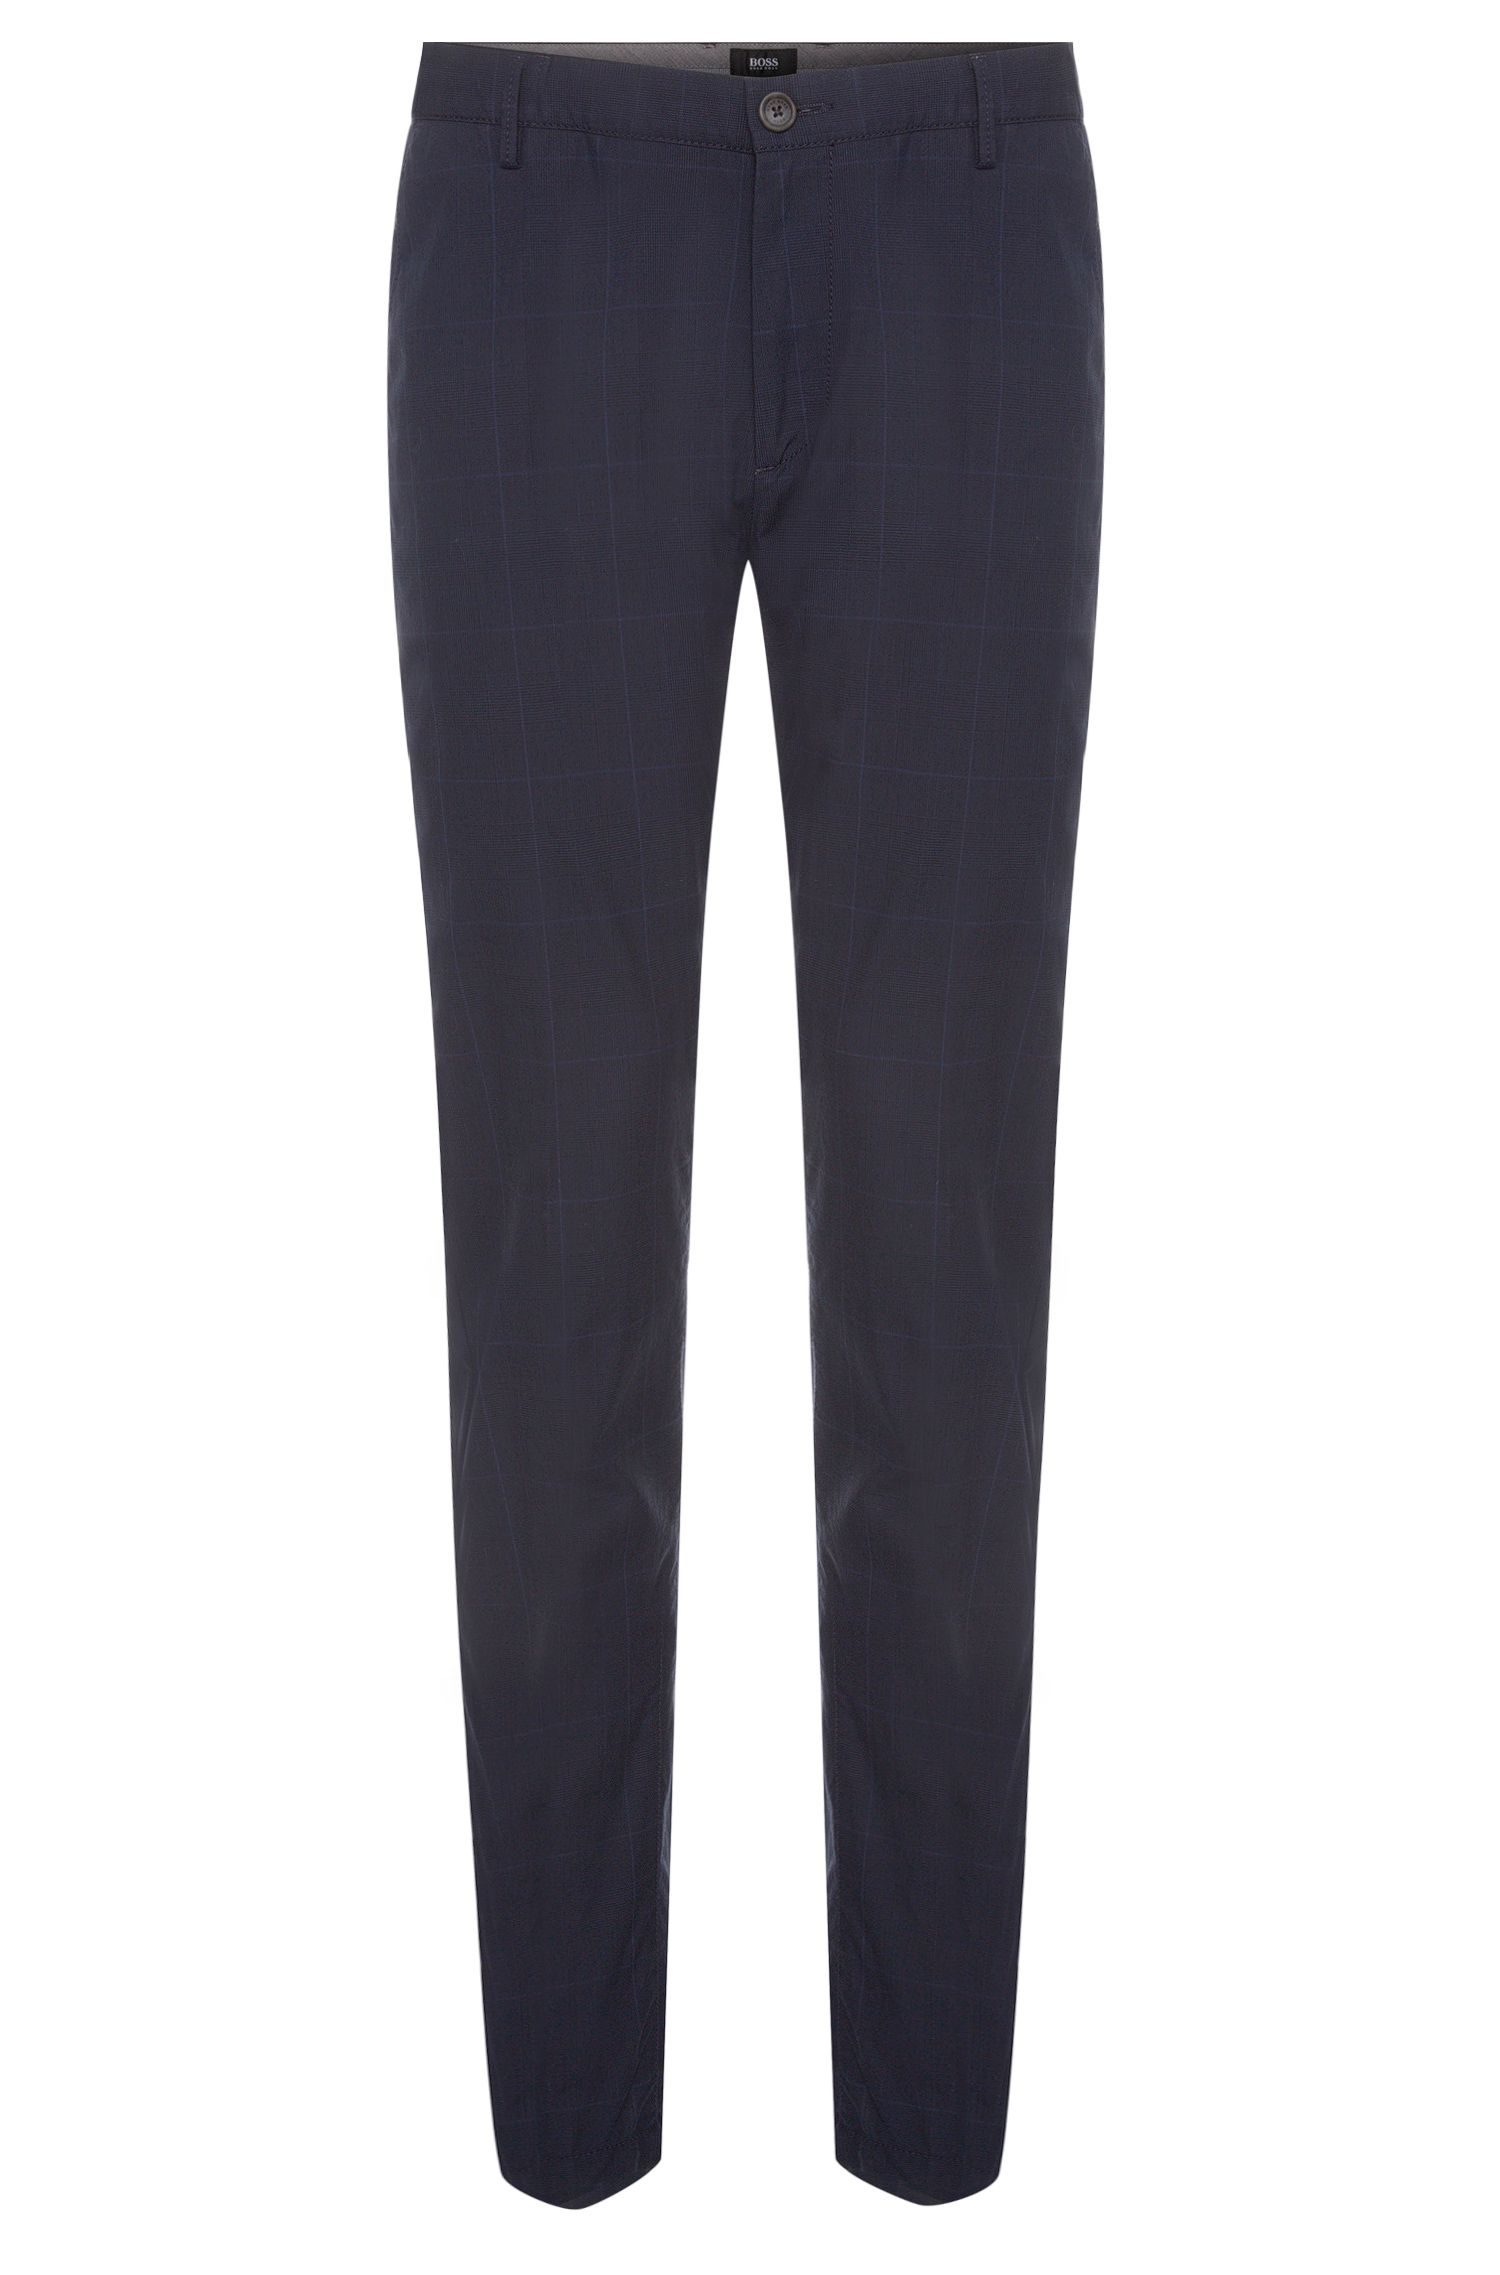 'Rice-W'   Slim Fit, Cotton Pants